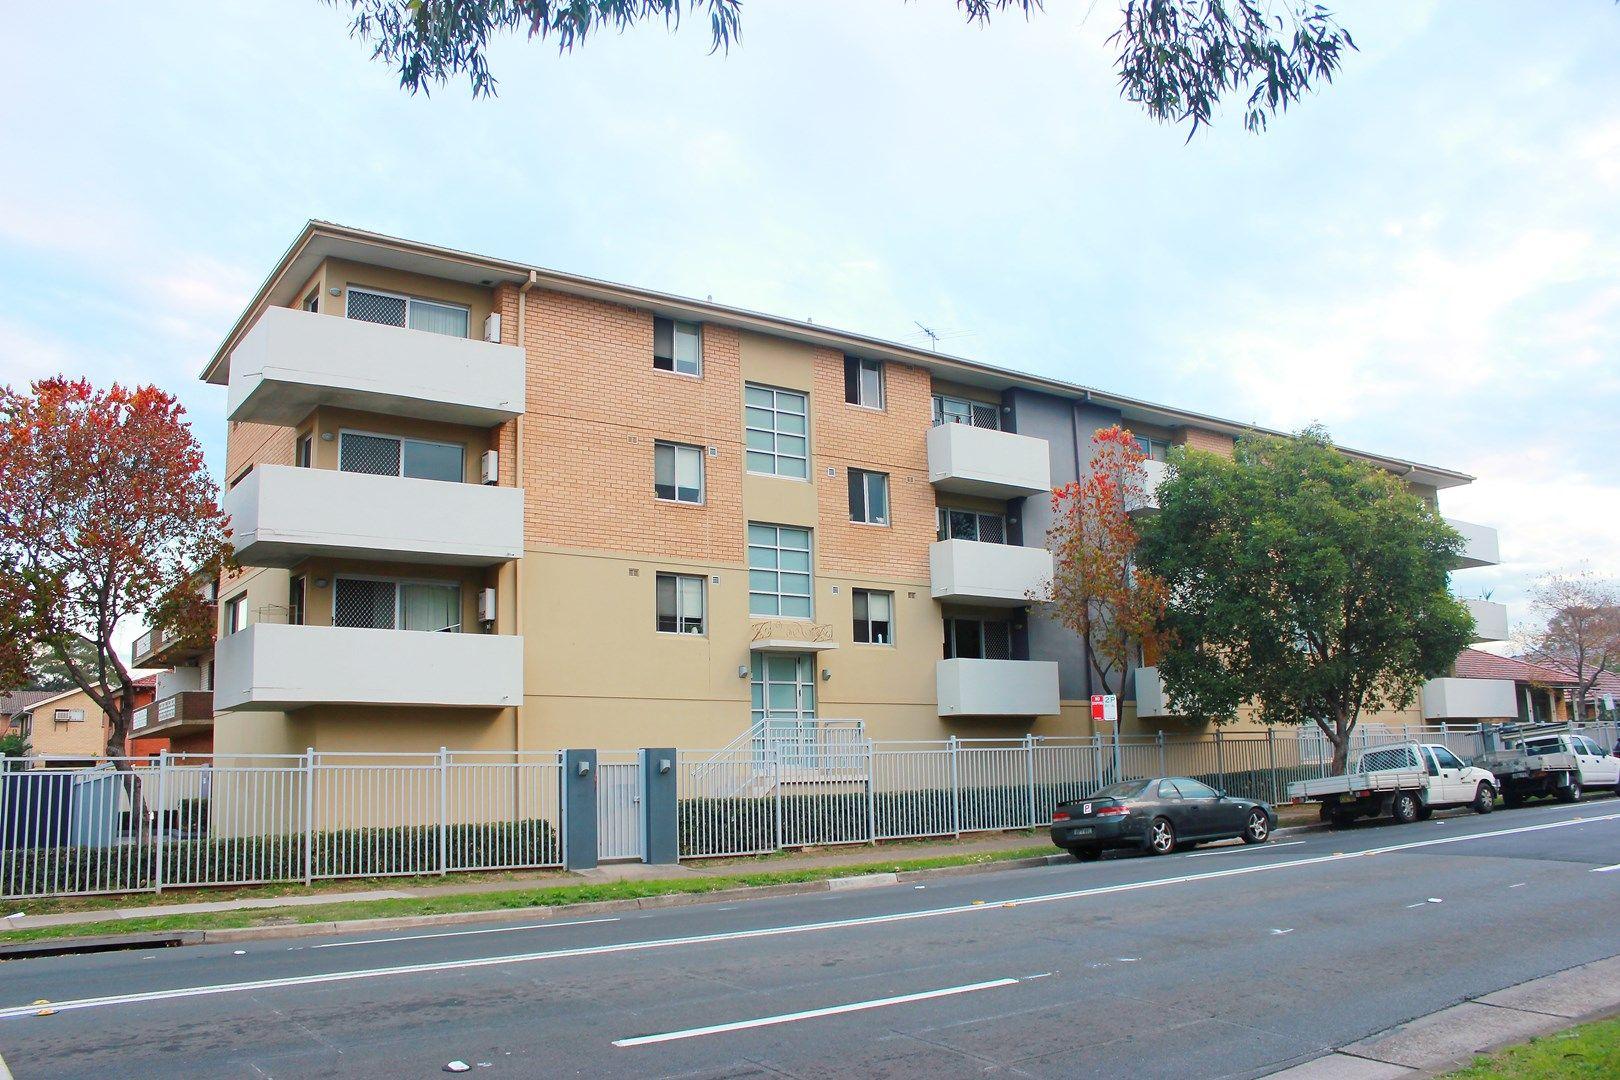 7/47 HILL STREET, Cabramatta NSW 2166, Image 0